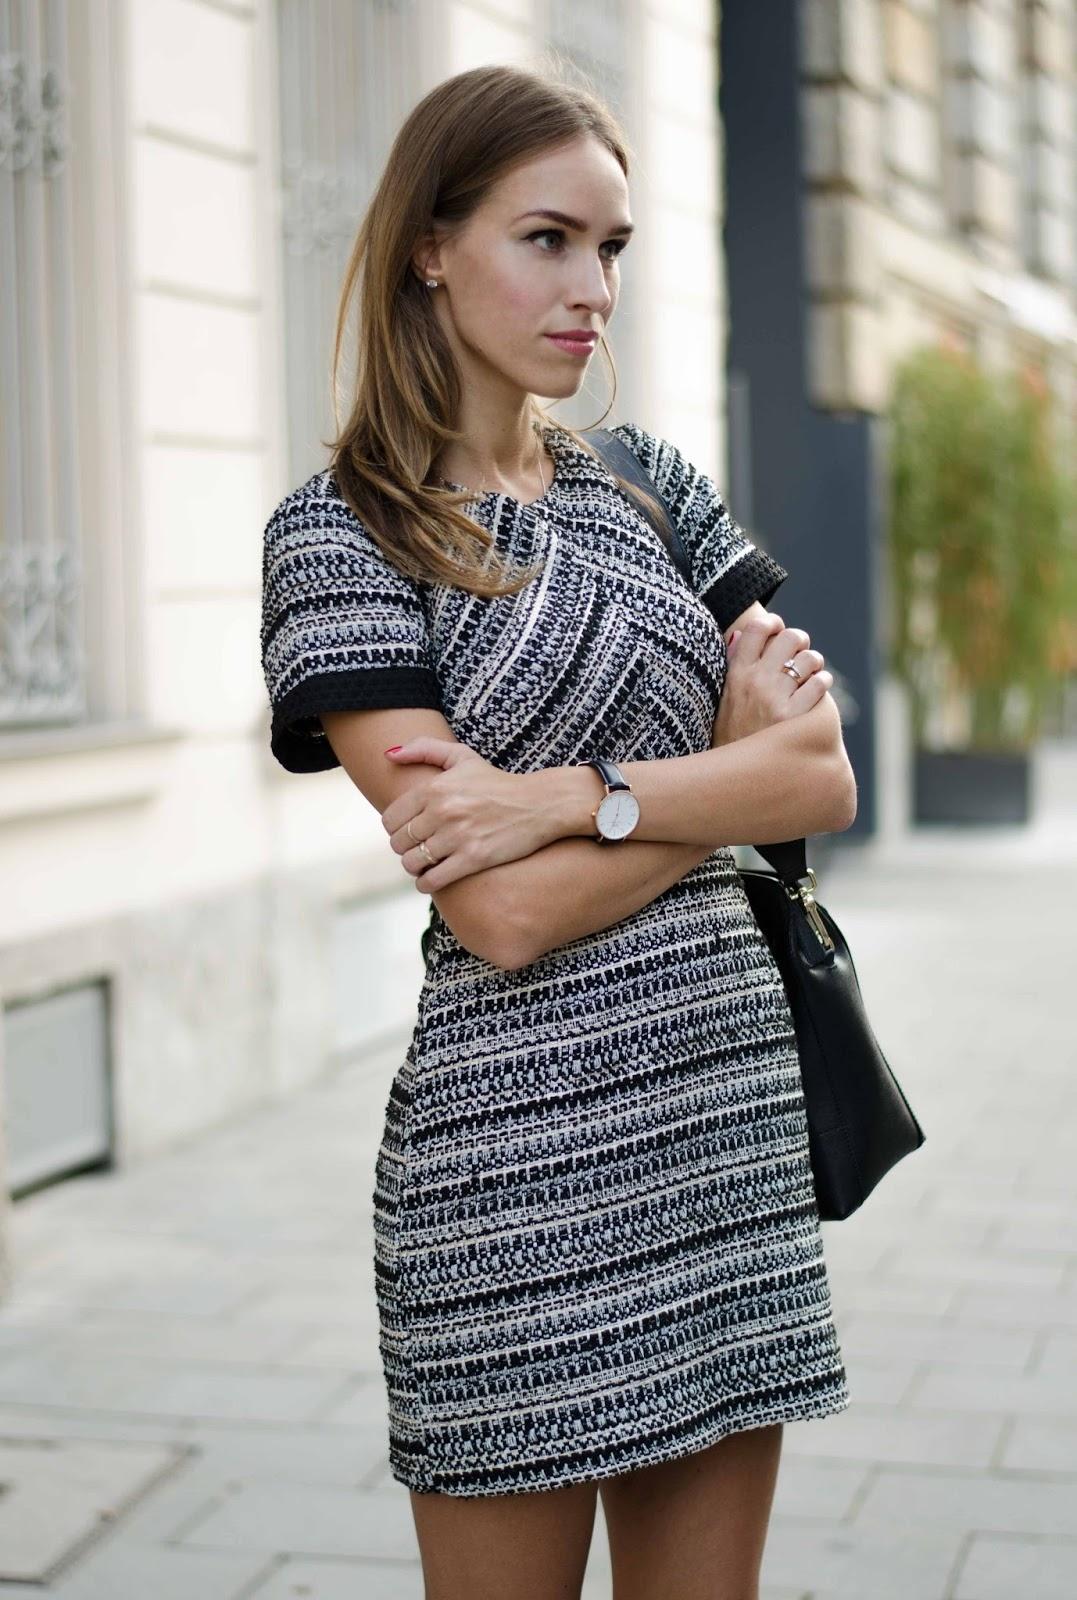 kristjaana mere hm mini dress daniel wellington watch fall outfit munich street style